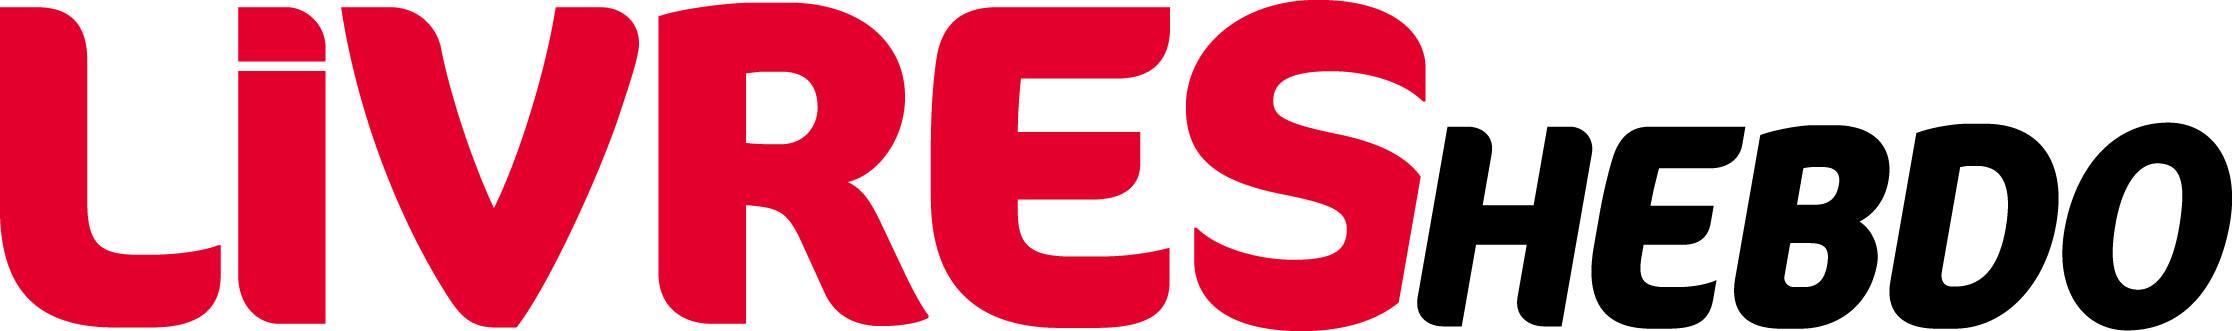 logo_5723